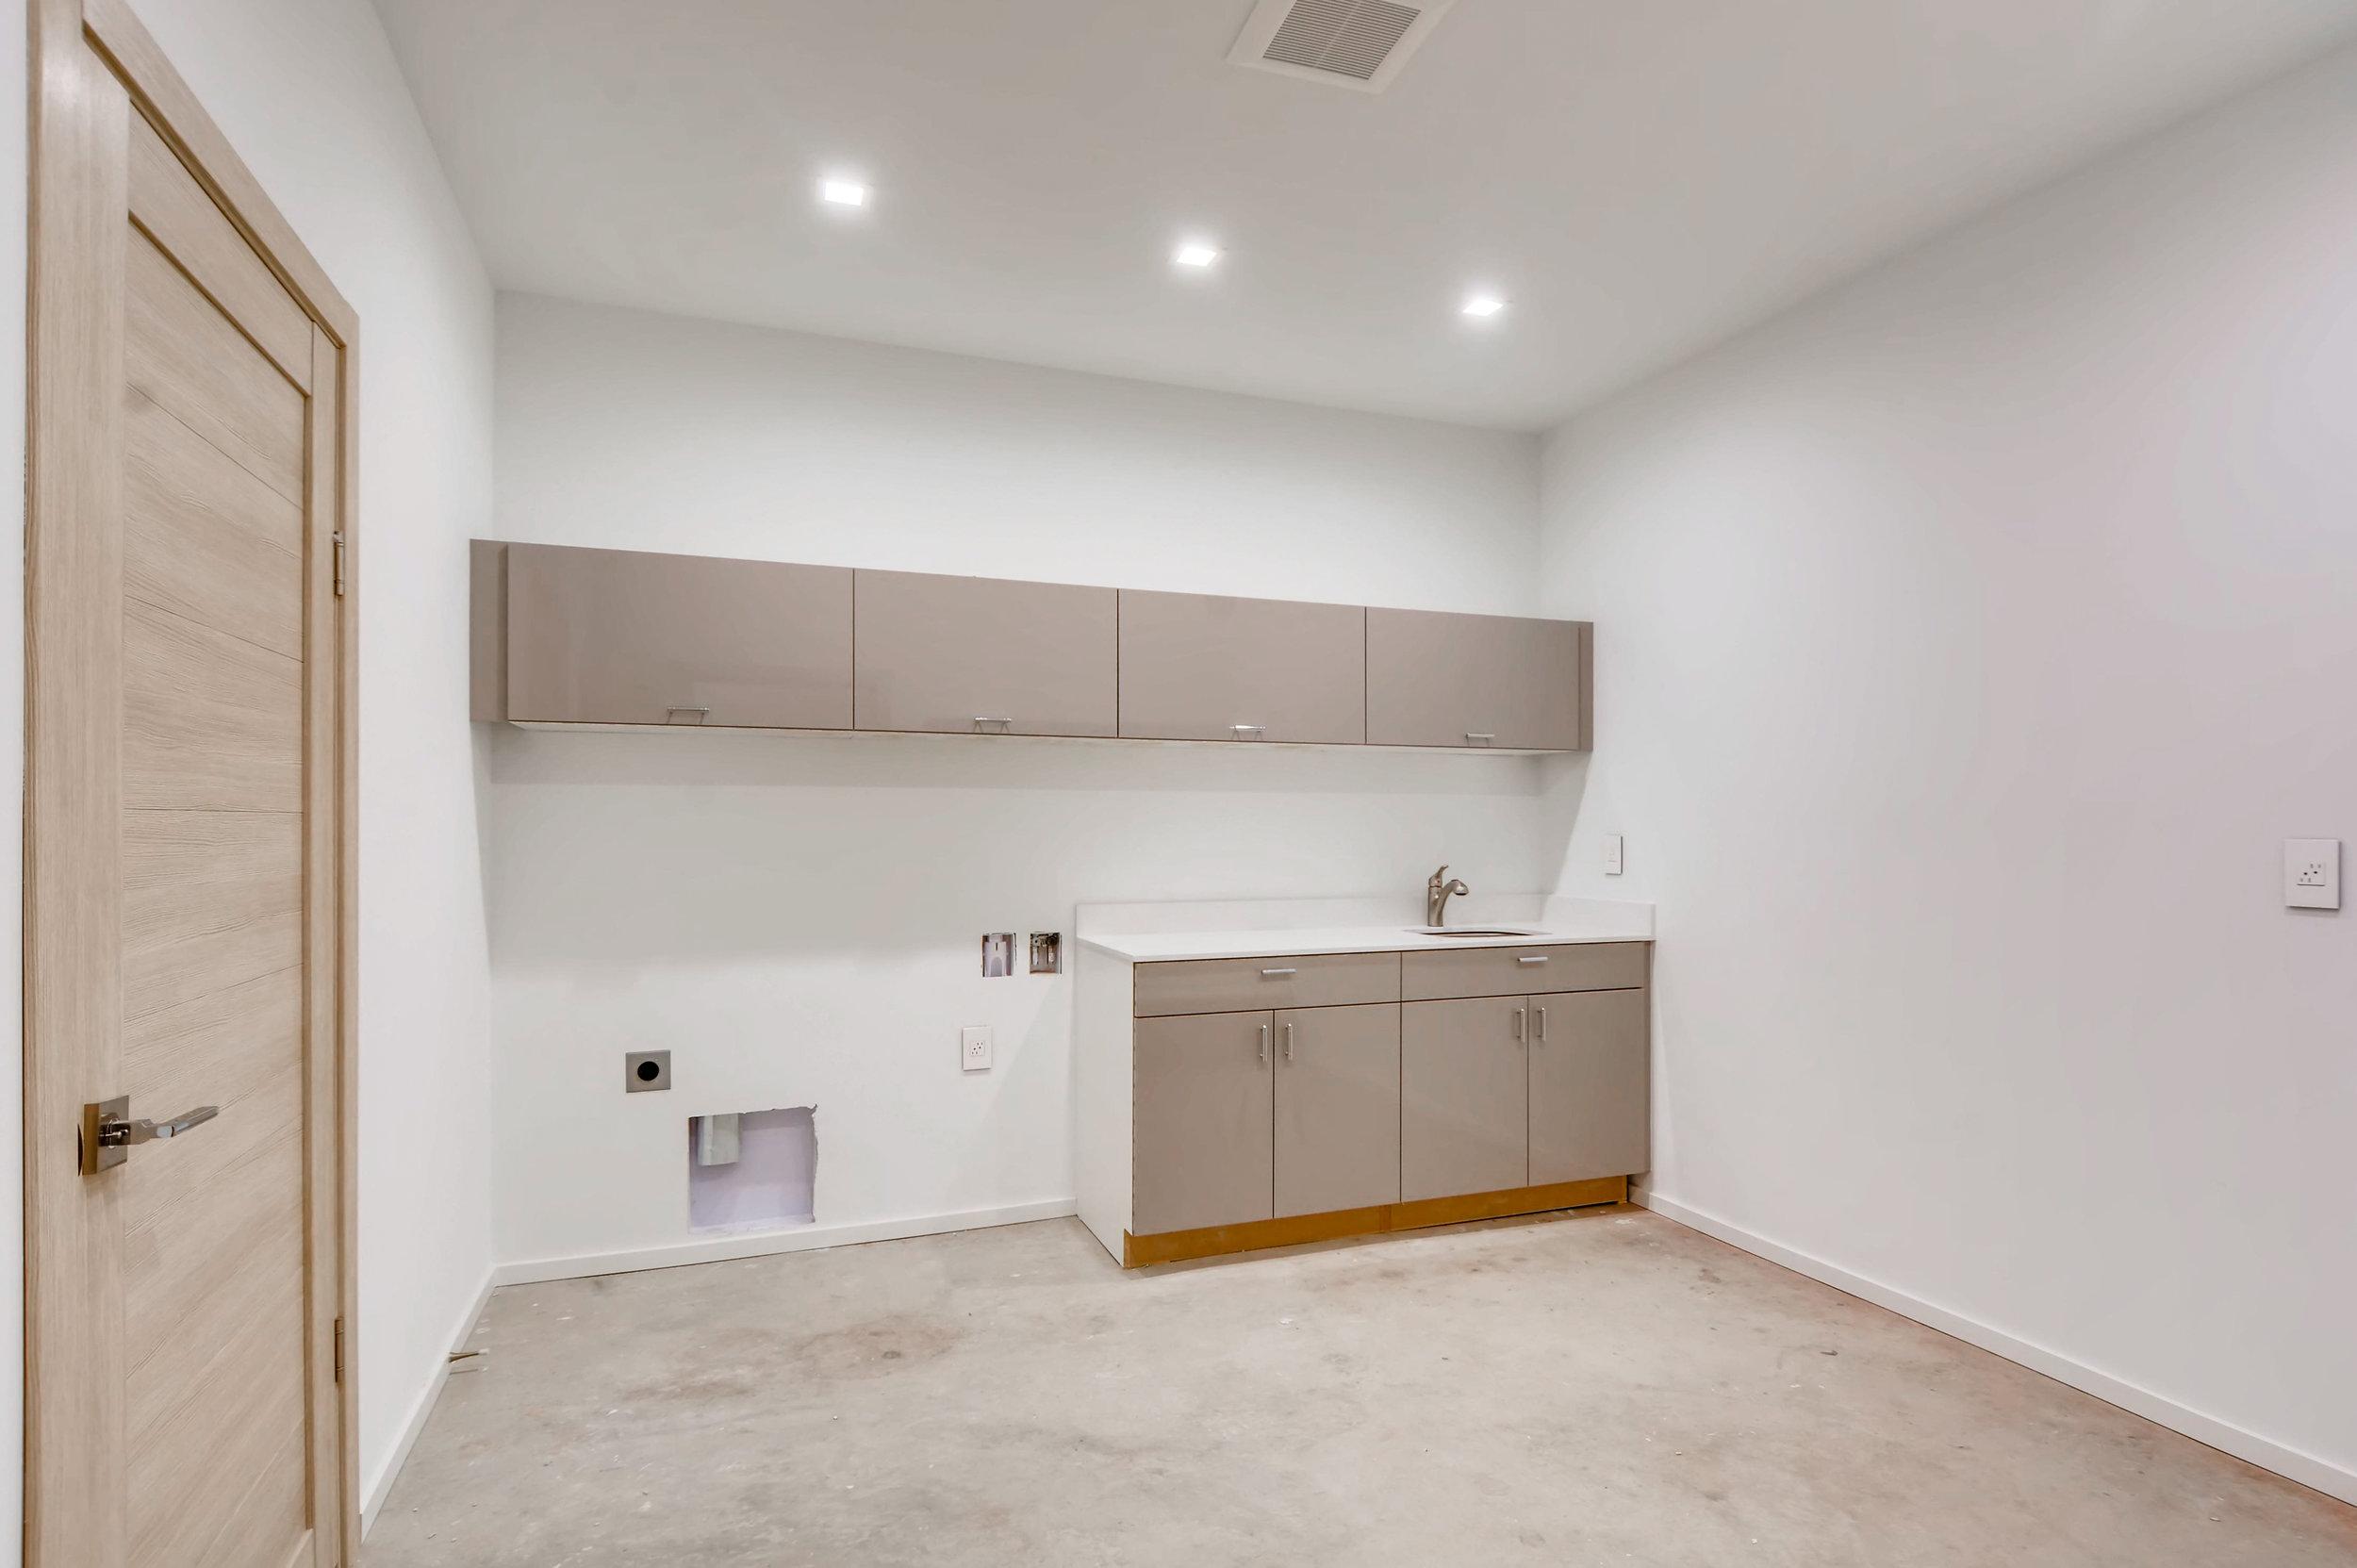 12410 Holmes Point Drive NE-print-033-28-Lower Level Laundry Room-4200x2795-300dpi.jpg